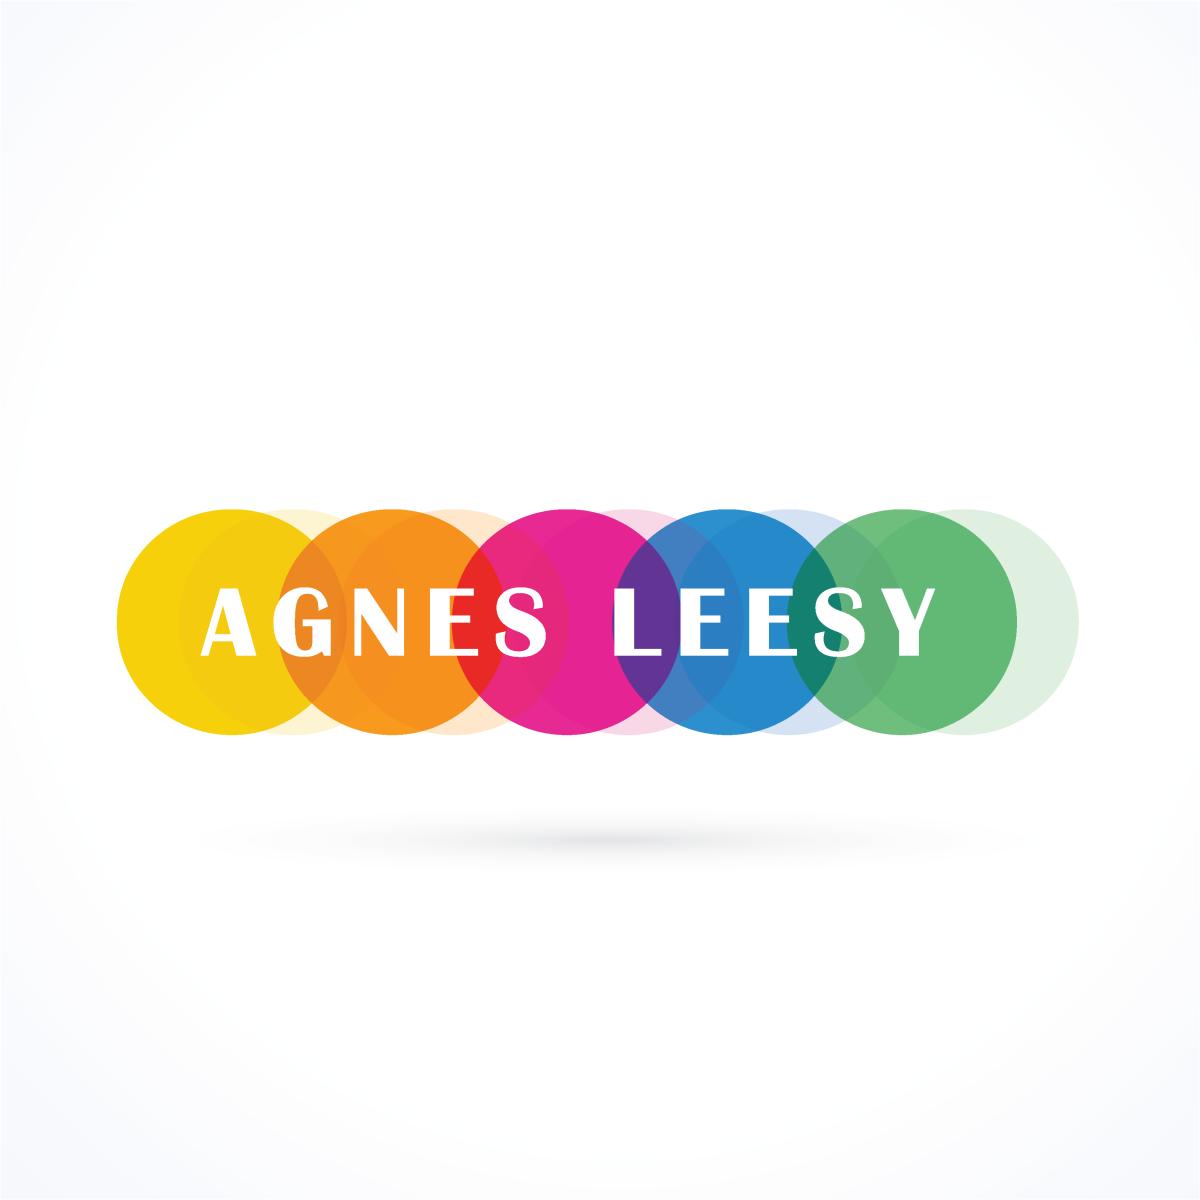 AGNES LEESY Life & Estate Planner